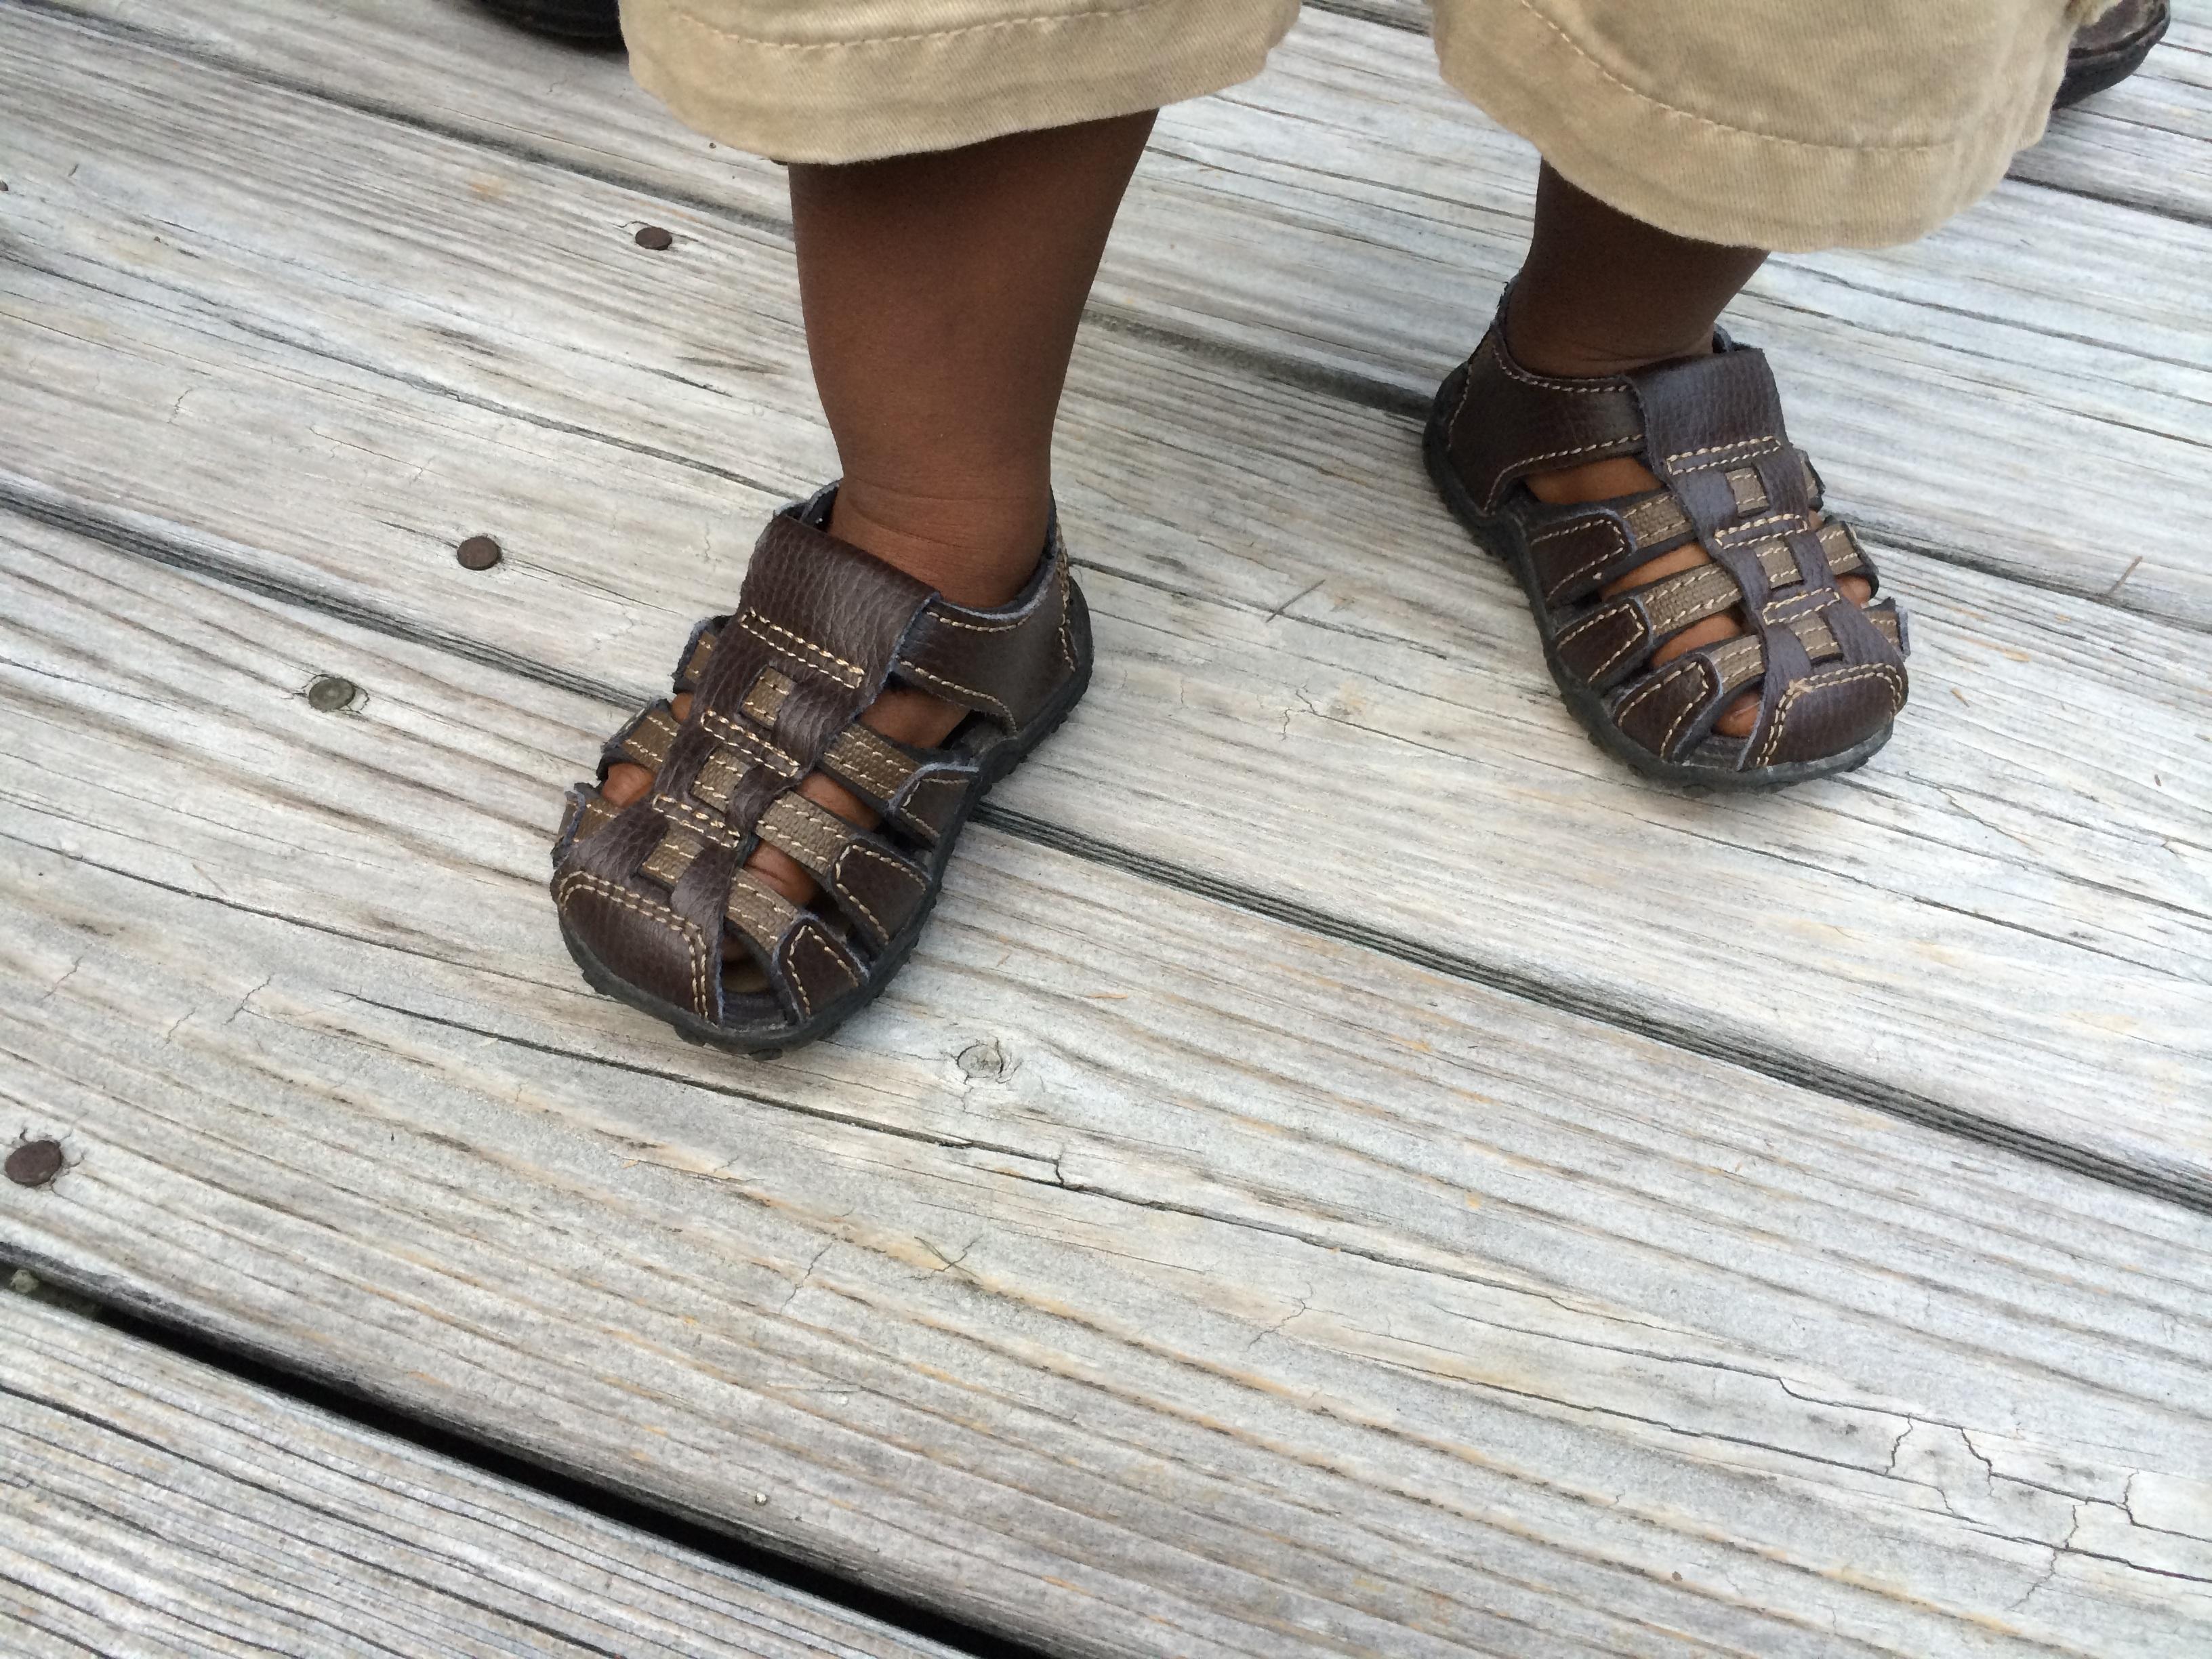 Fotos gratis : zapato, madera, piso, niño, linda, bota, pierna ...